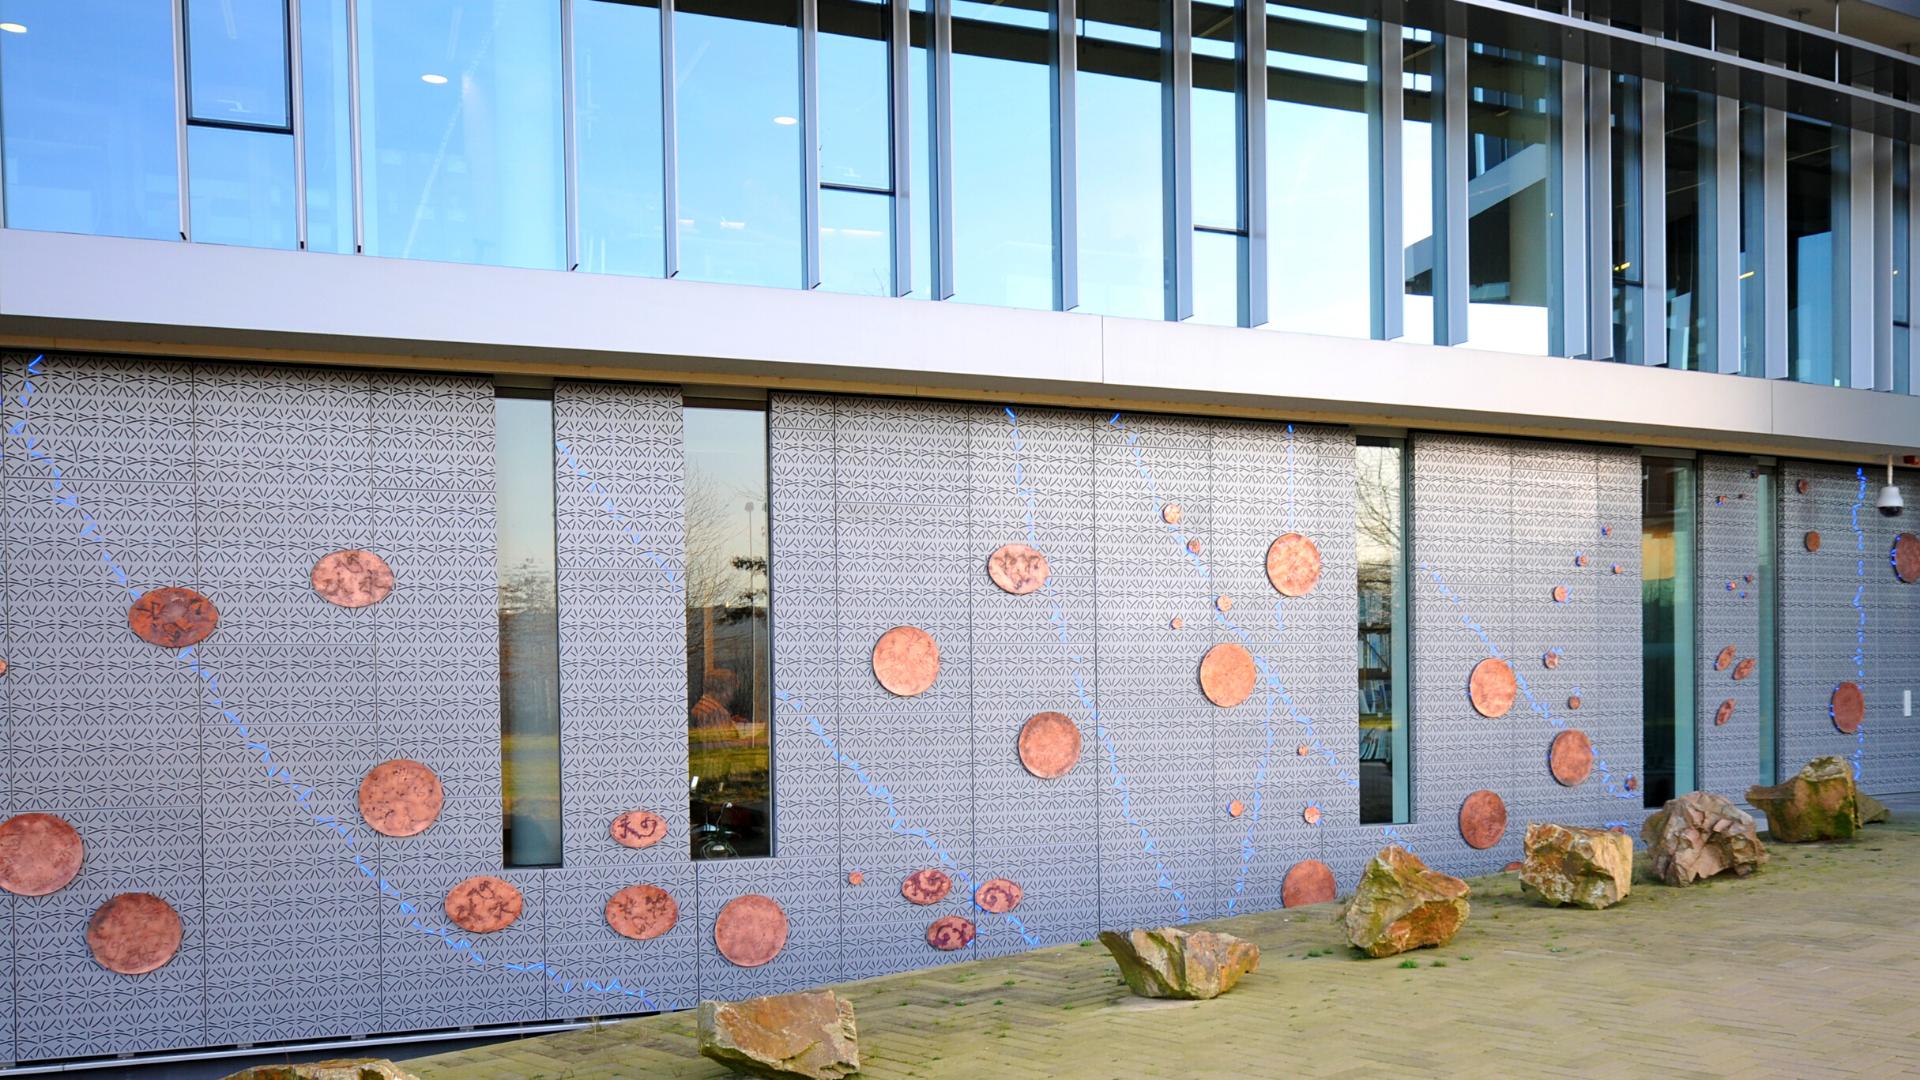 Waterschap-Doetinchem-gevel-perforation-panel-facade-side